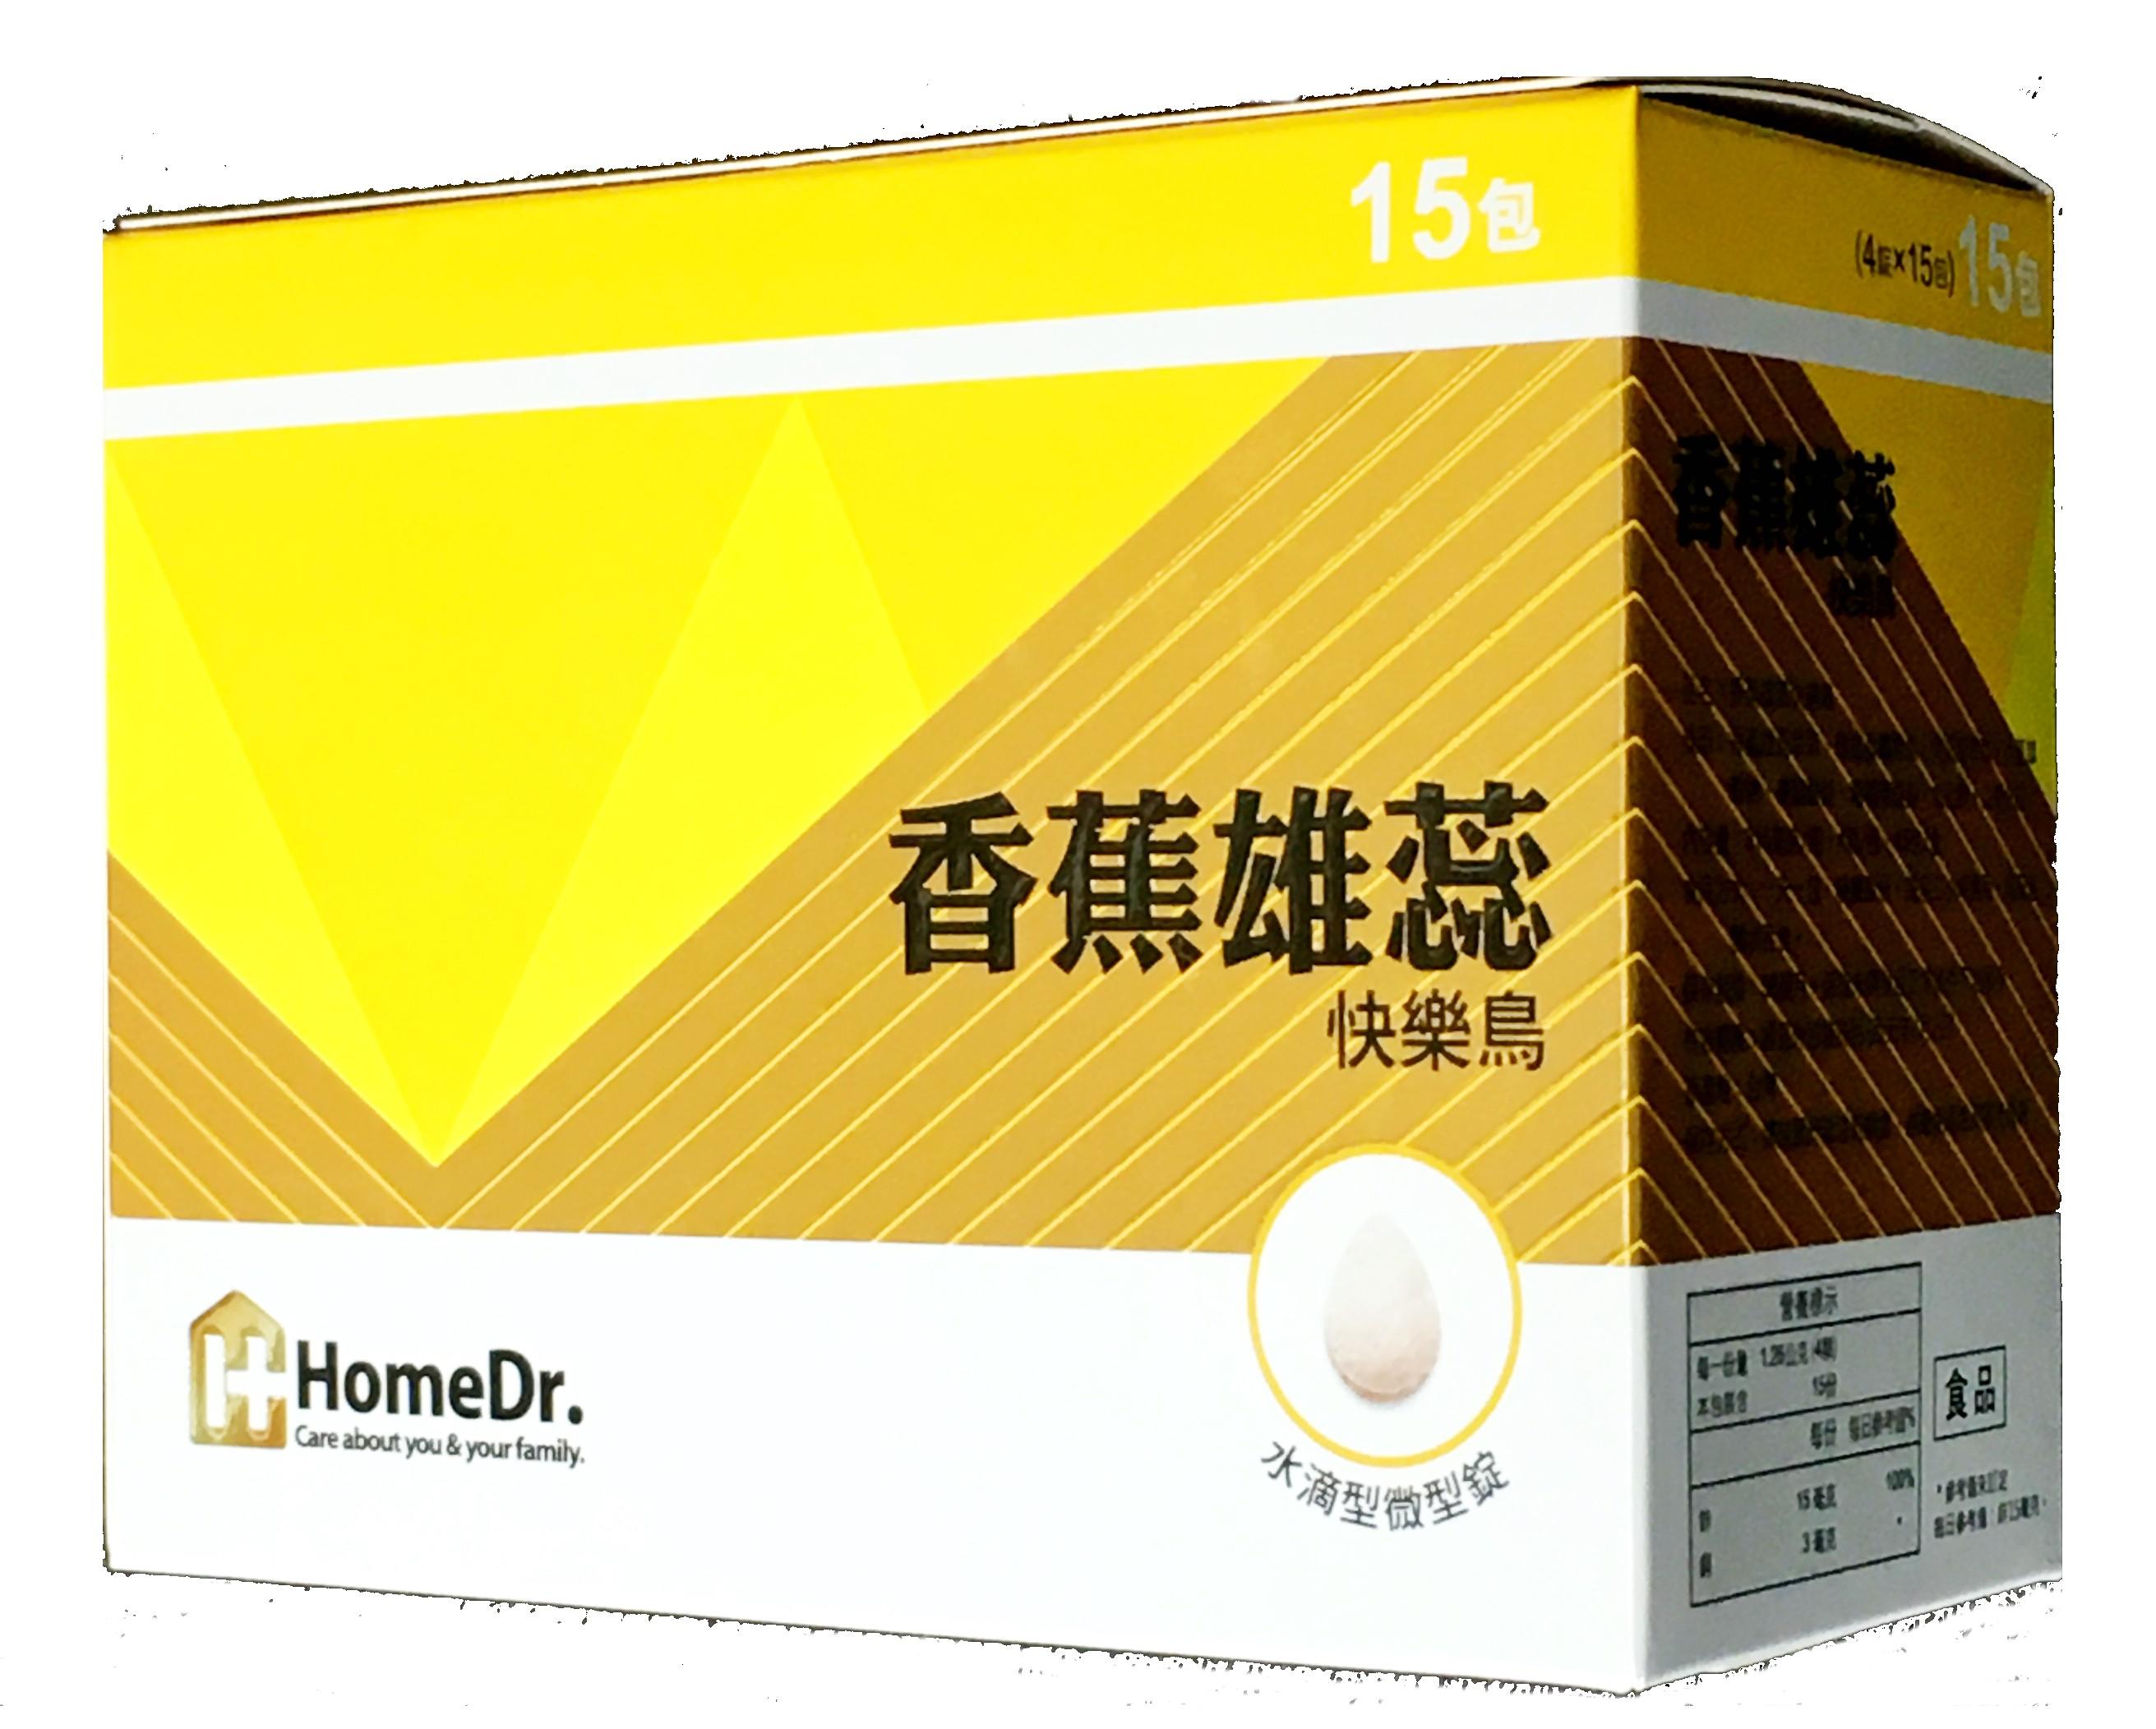 Home Dr. 香蕉雄蕊快樂鳥 60顆/盒◆德瑞健康家◆